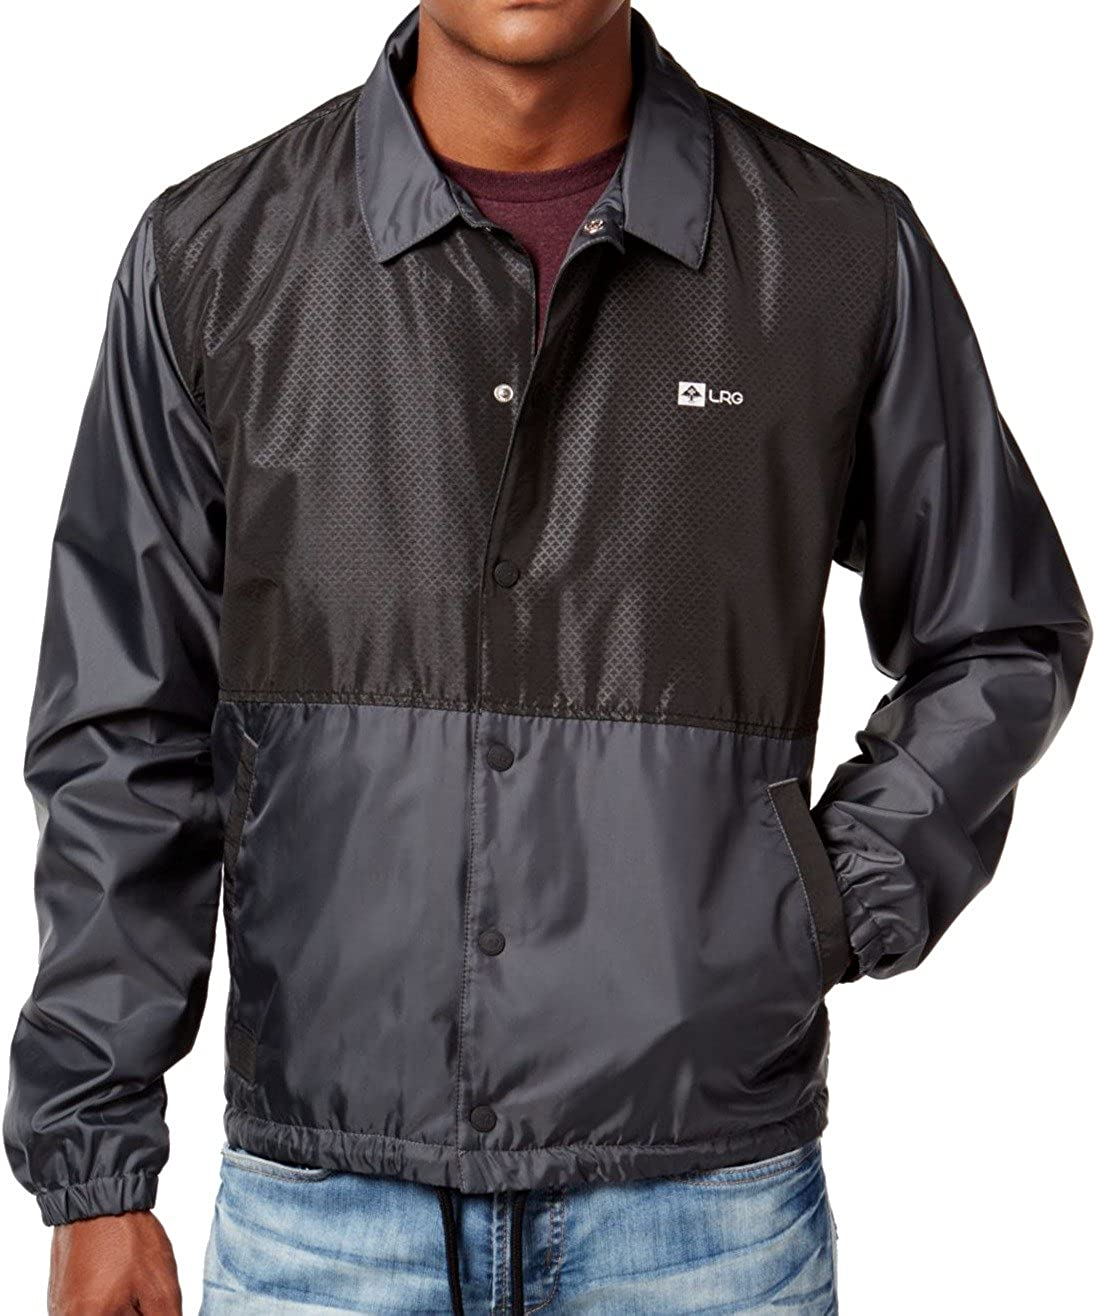 LRG High Definition Black Grey Metallic Lining Windbreaker Men's Jacket